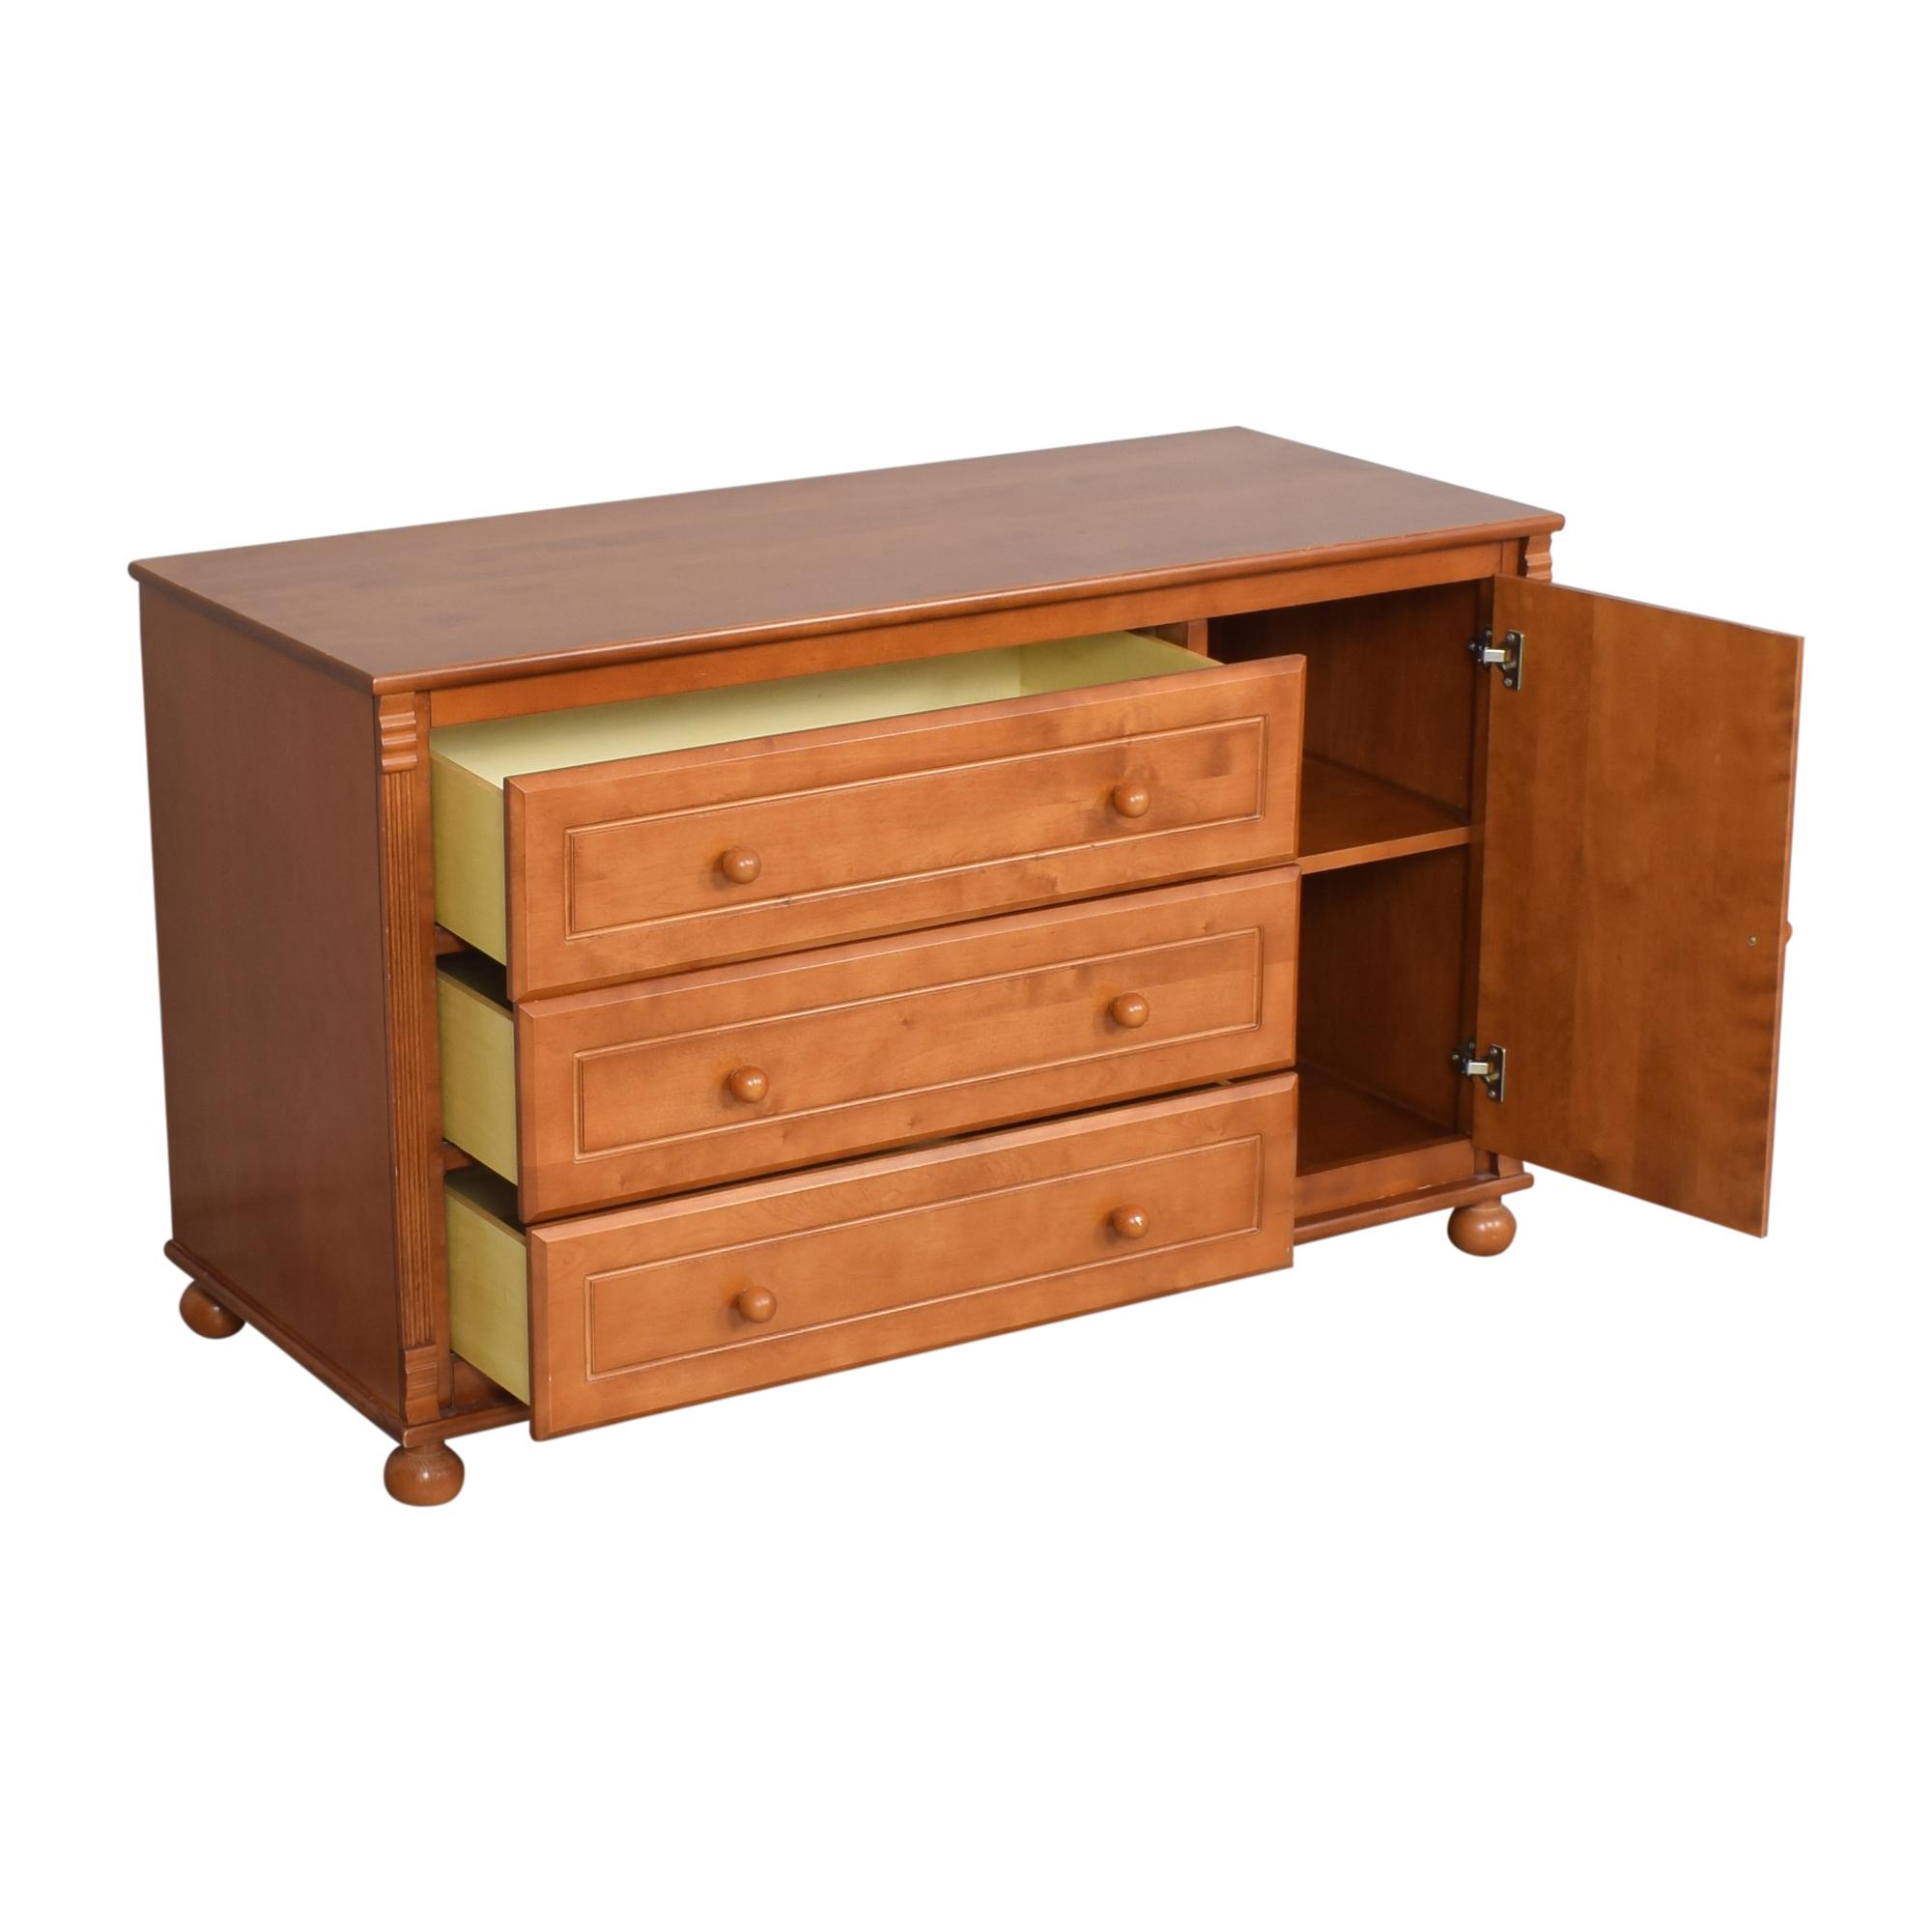 Bellini Bellini Jessica Three Drawer One Door Dresser on sale